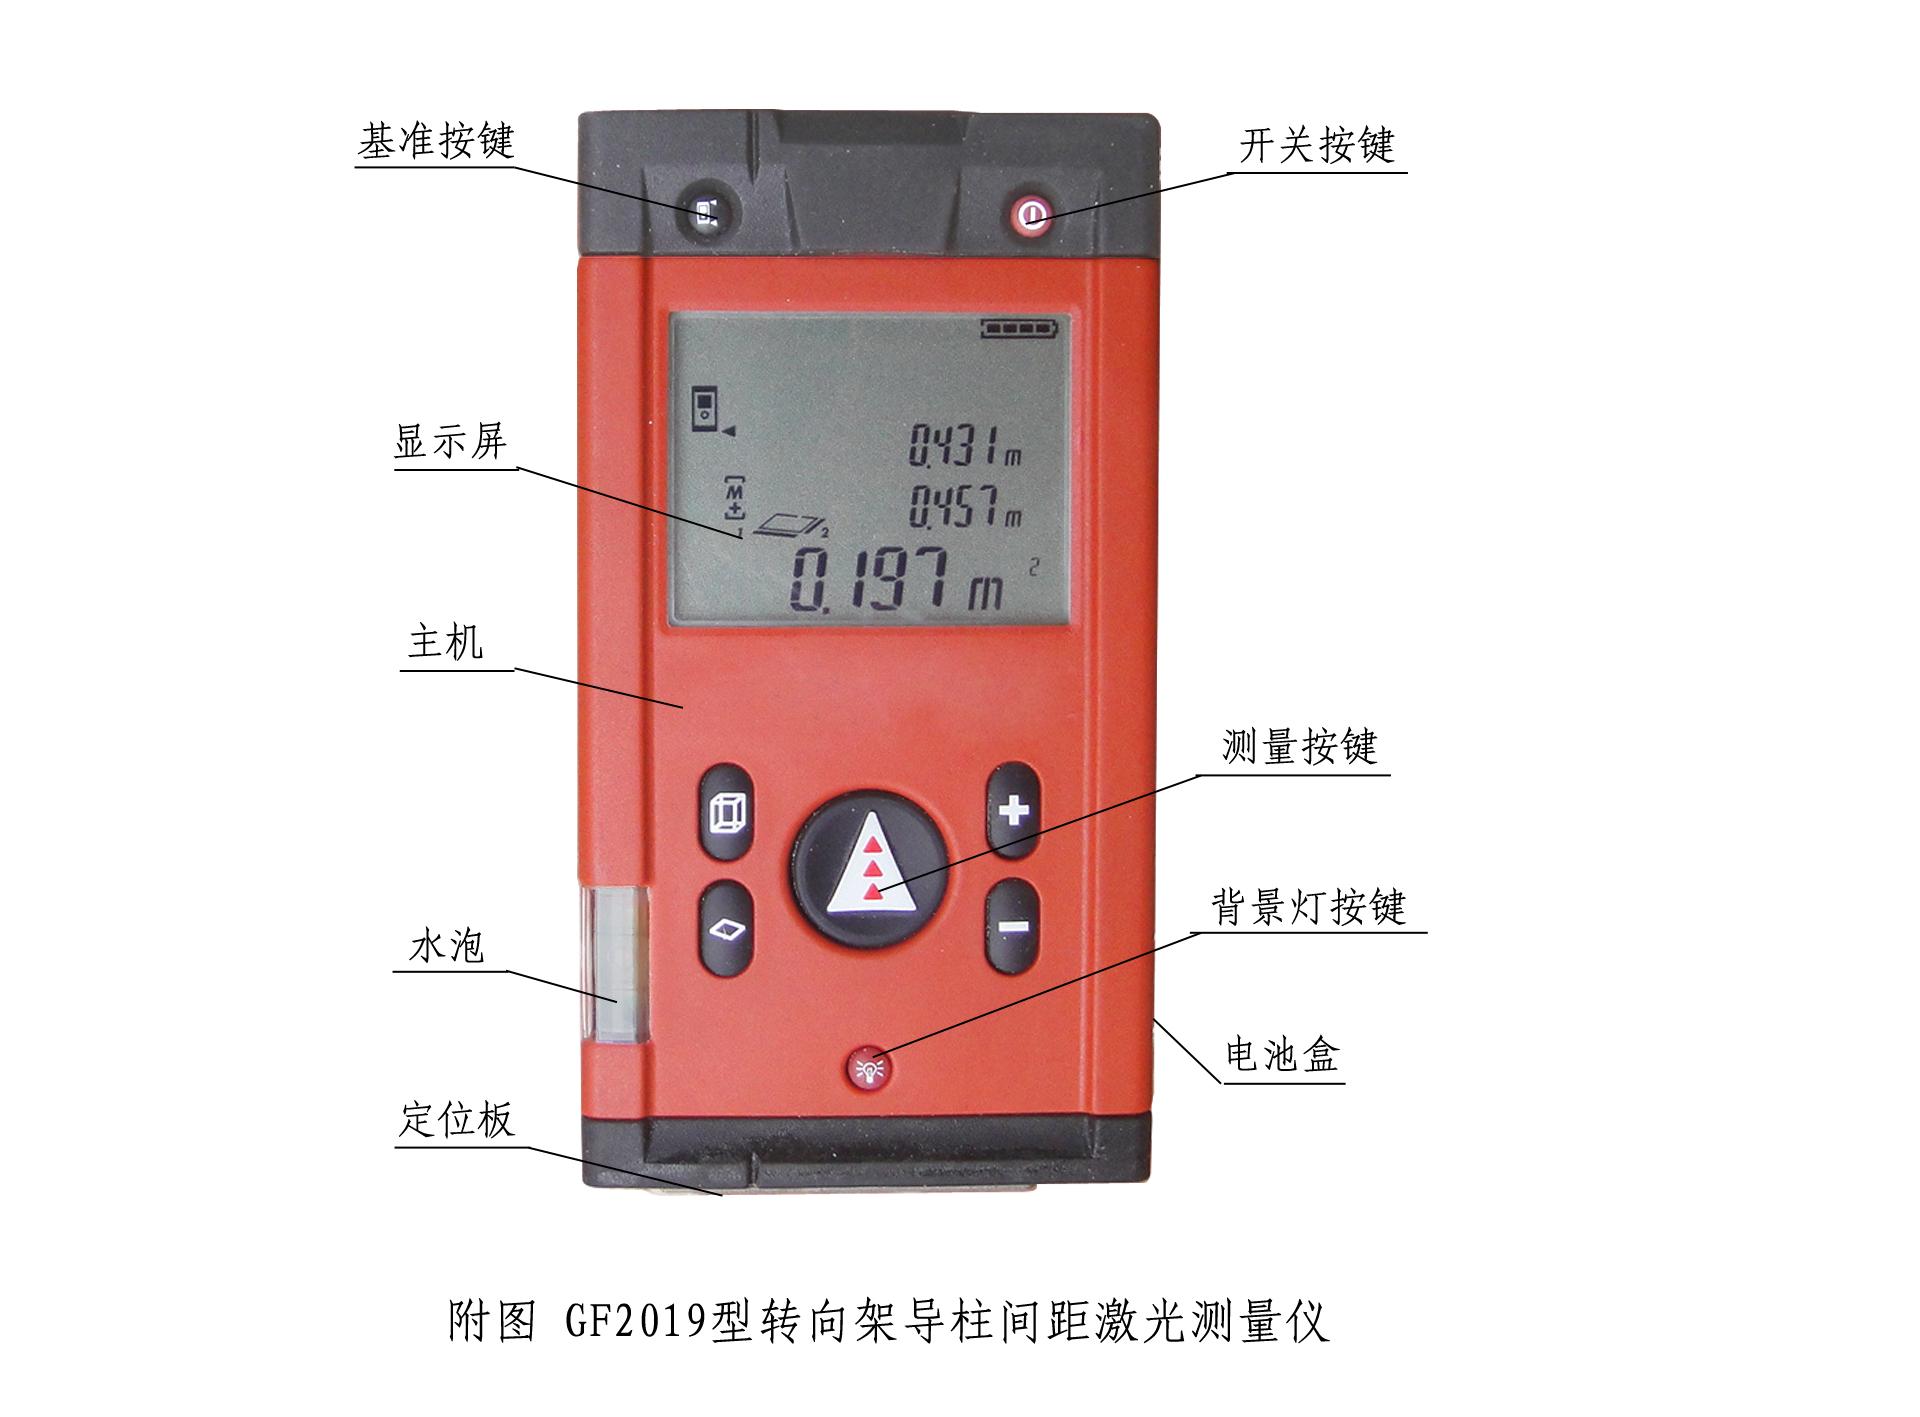 GF2019型转向架导柱间距激光测量仪